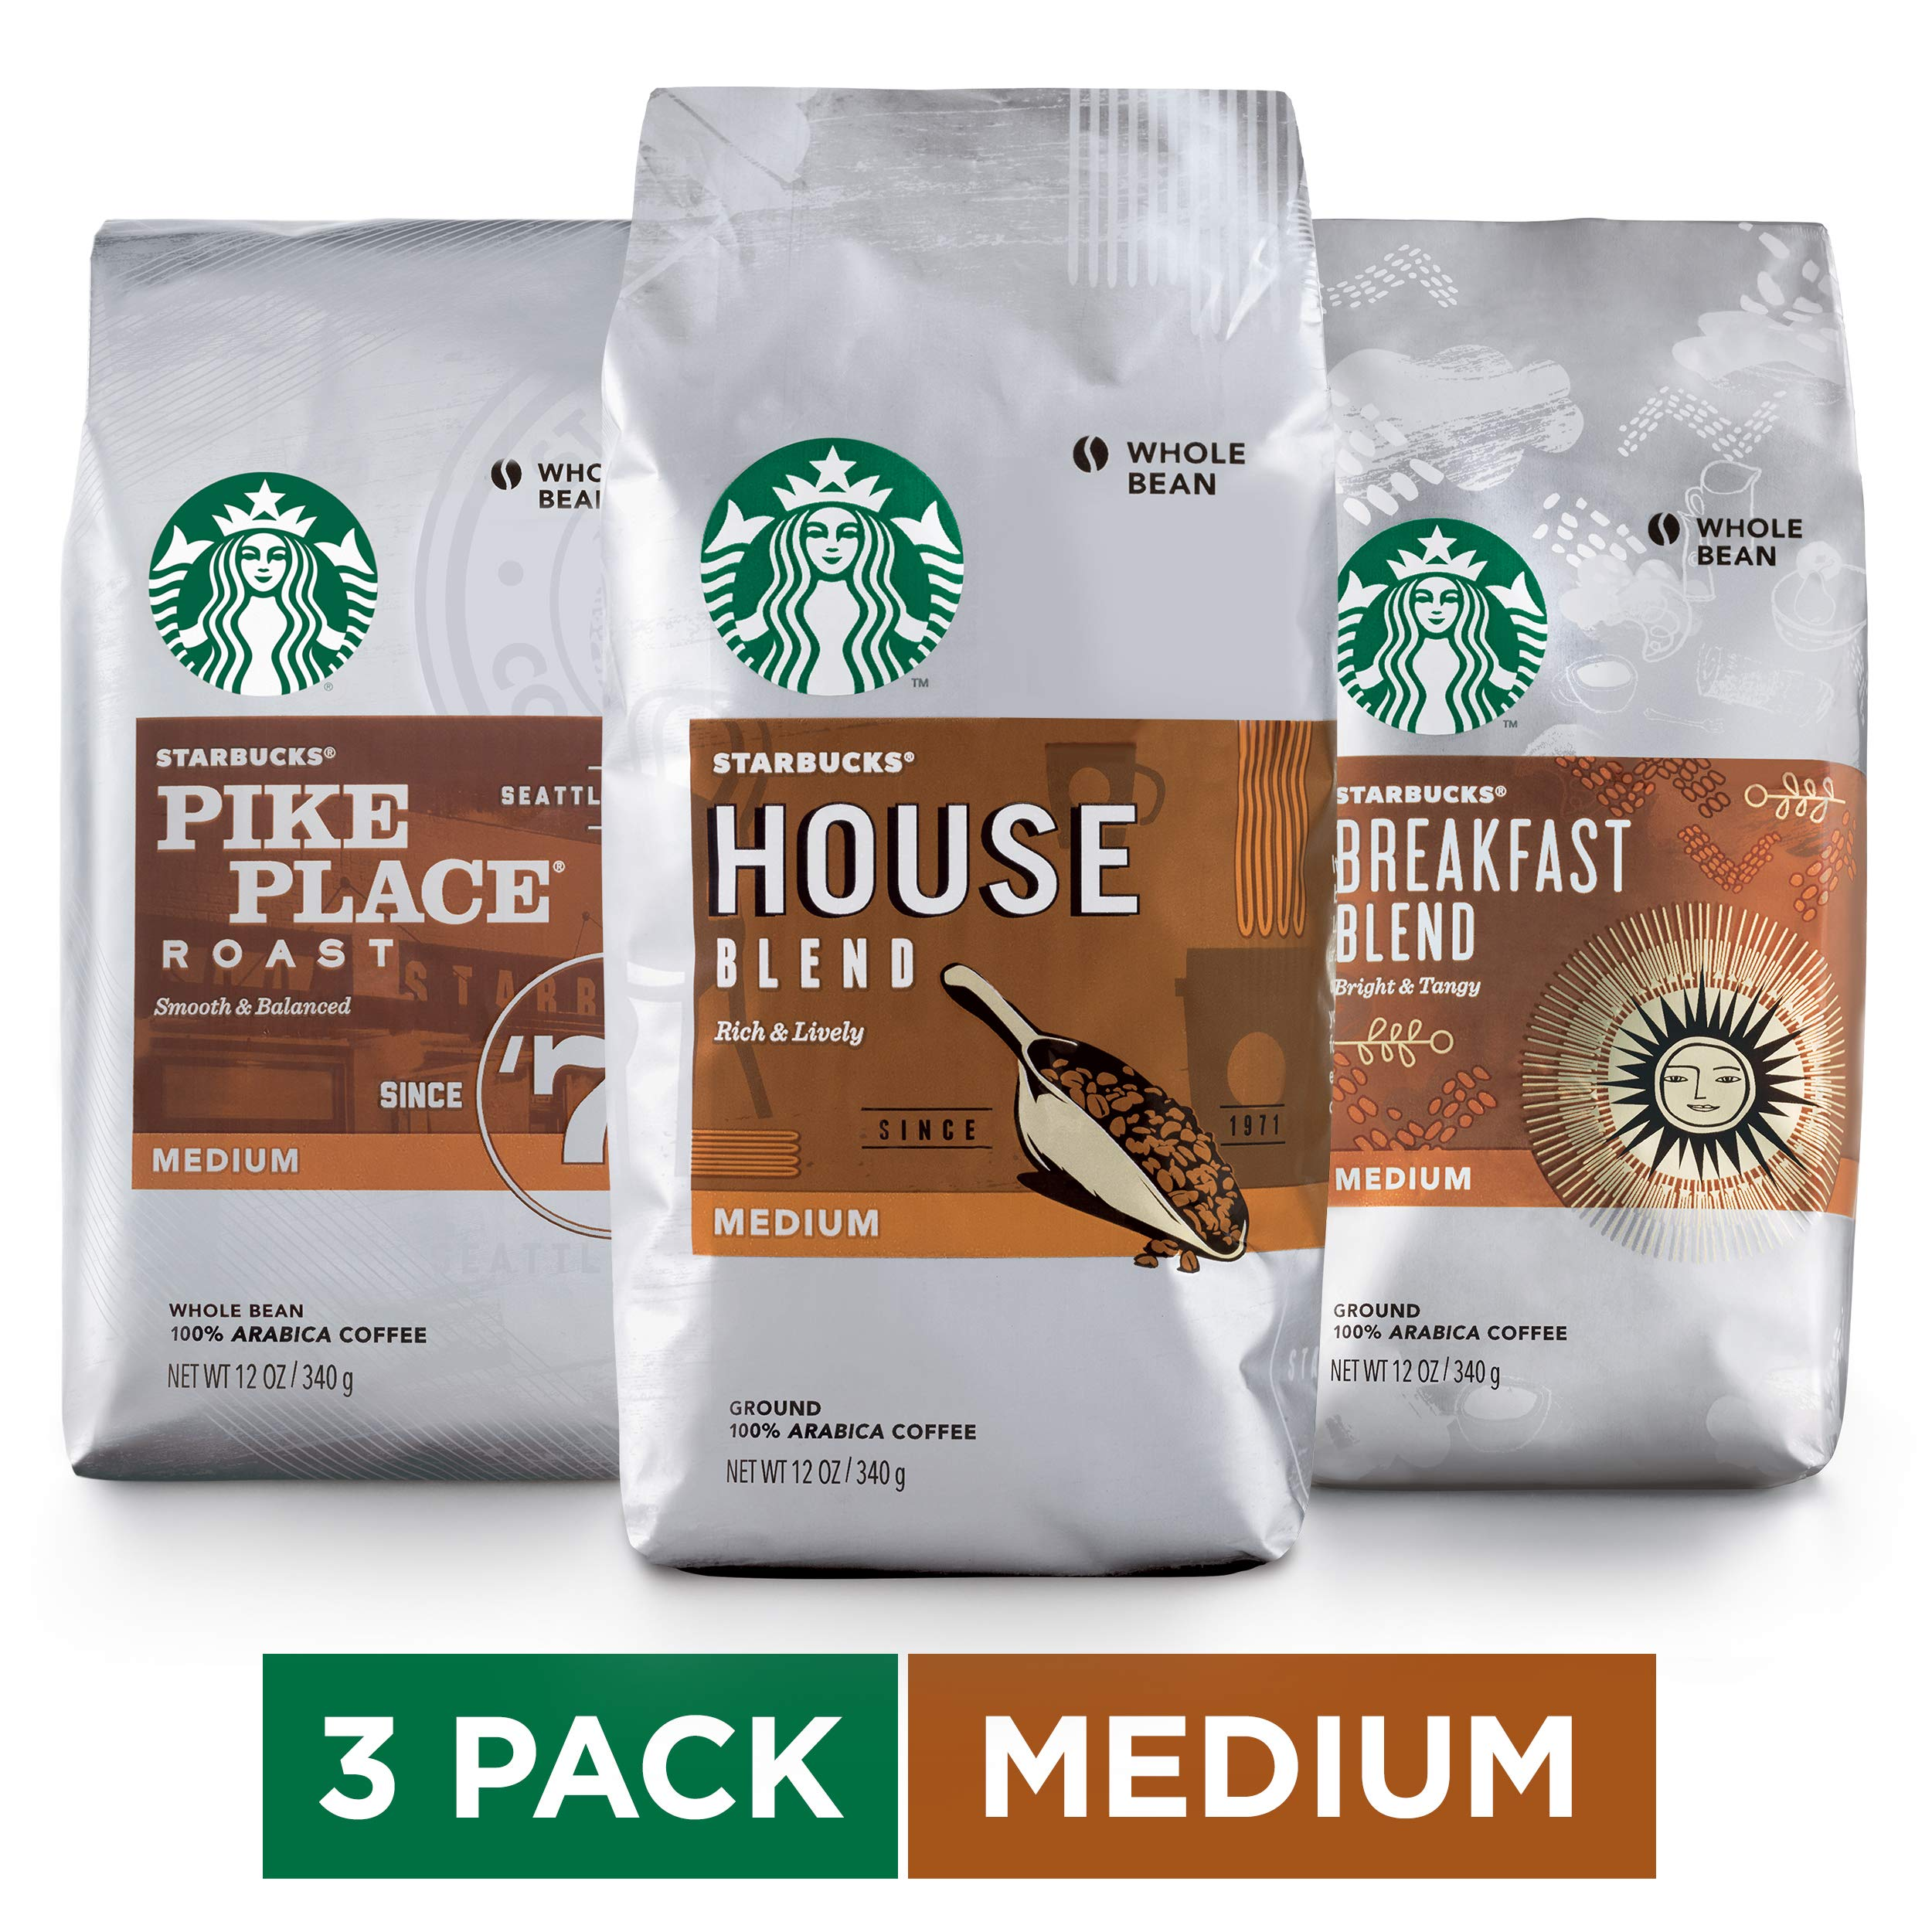 Starbucks Medium Roast Whole Bean Coffee Variety Pack, Three 12-oz. Bags by Starbucks